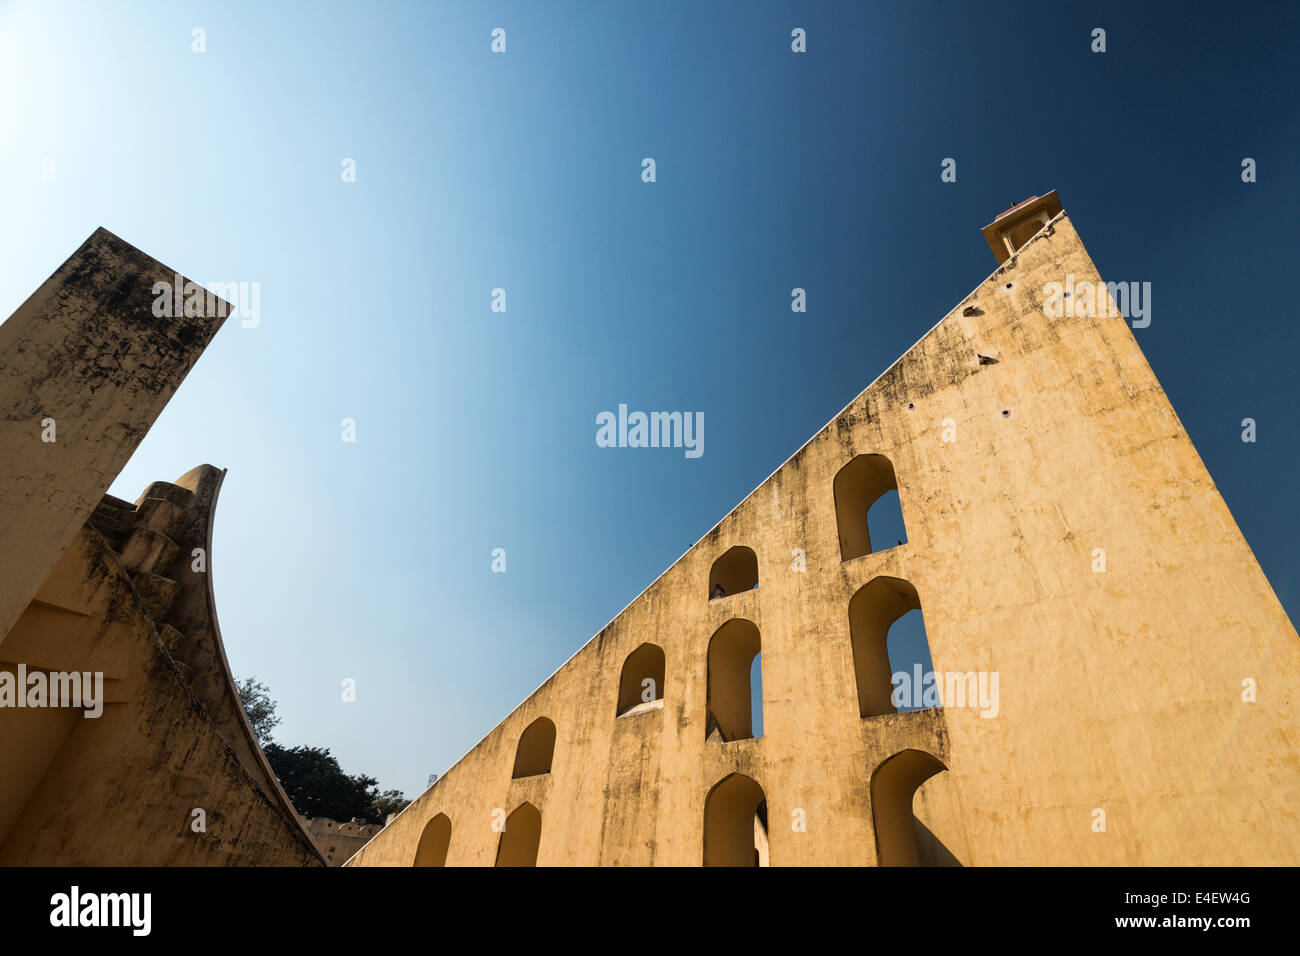 Jantar Mantar, giant osservatorio astronomico a Jaipur, India. Immagini Stock